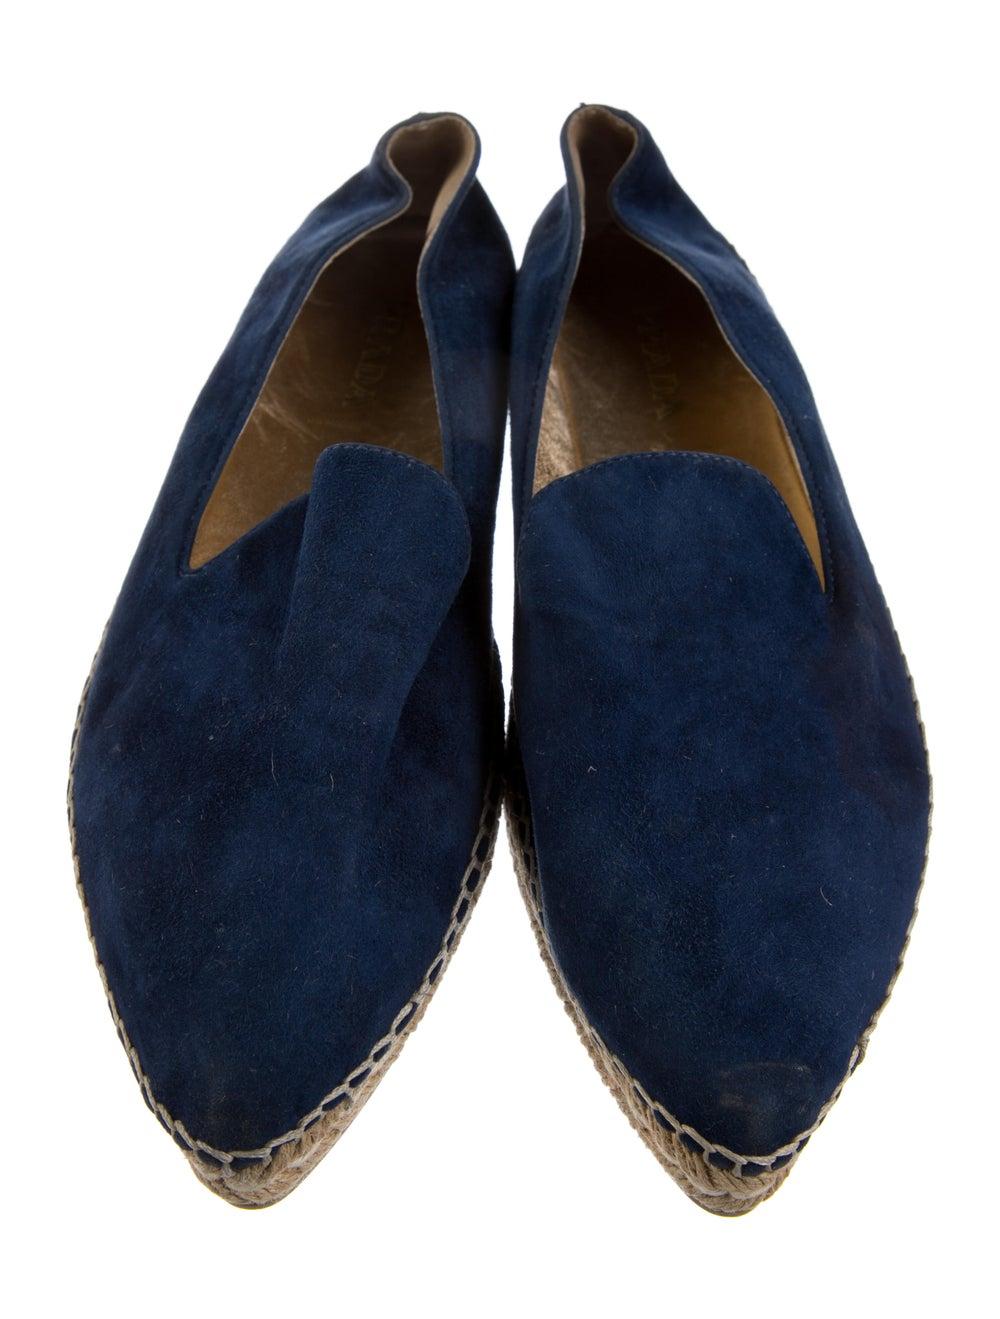 Prada Suede Espadrilles Blue - image 3